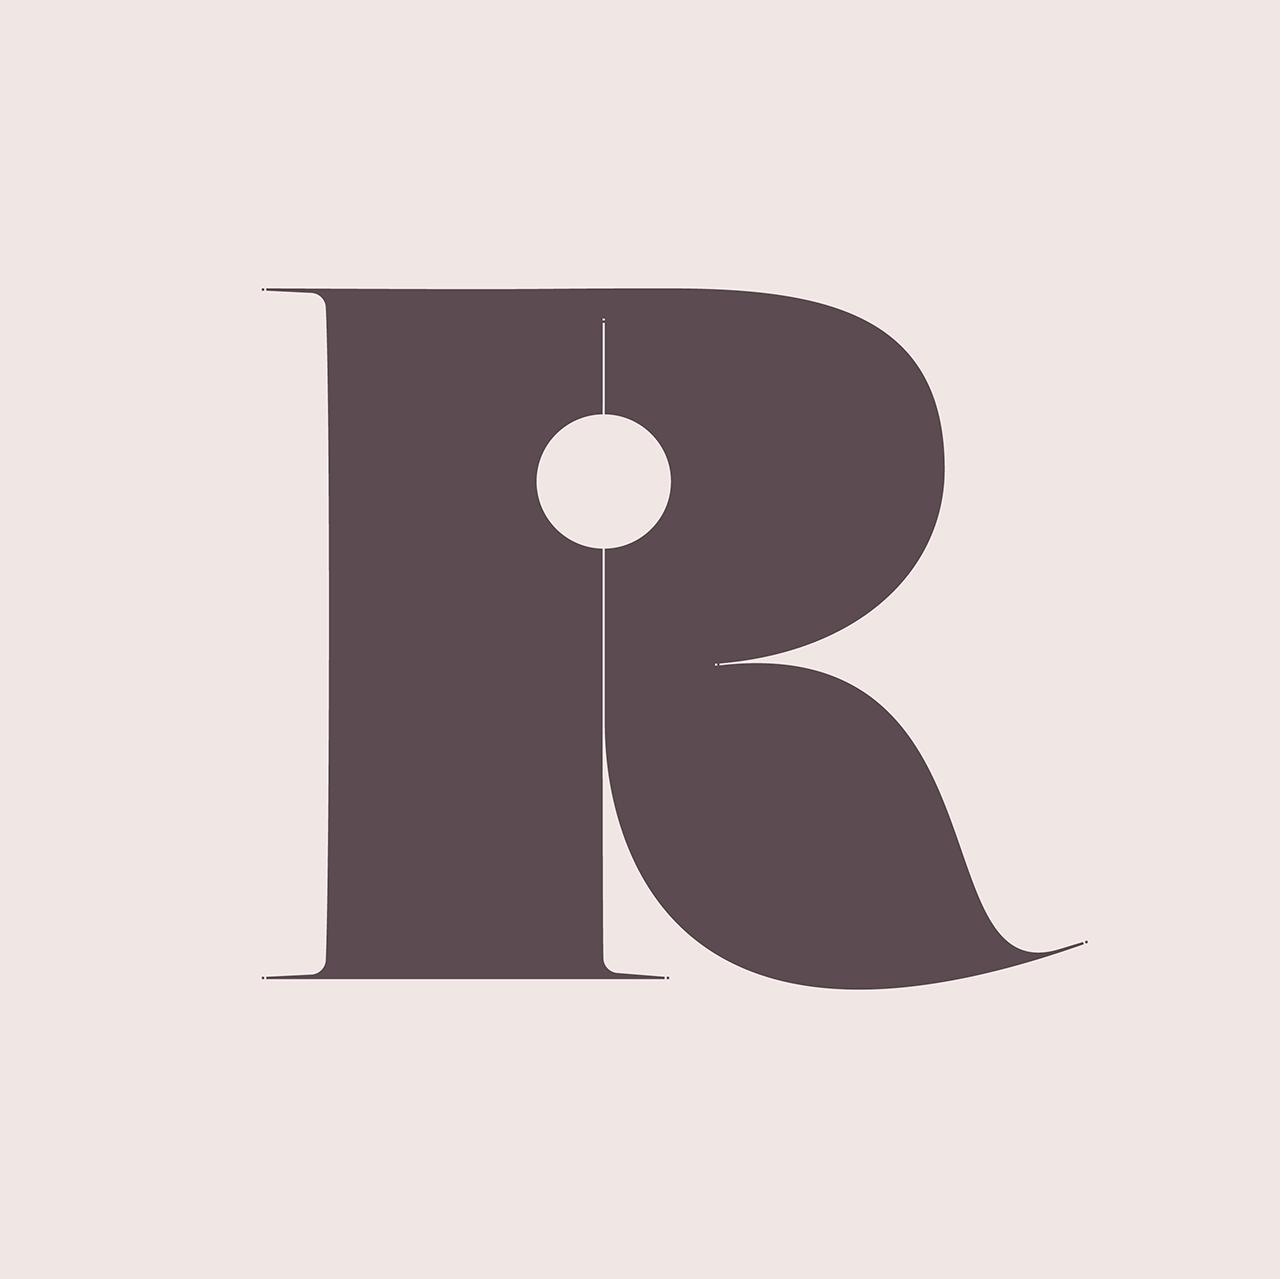 R shape